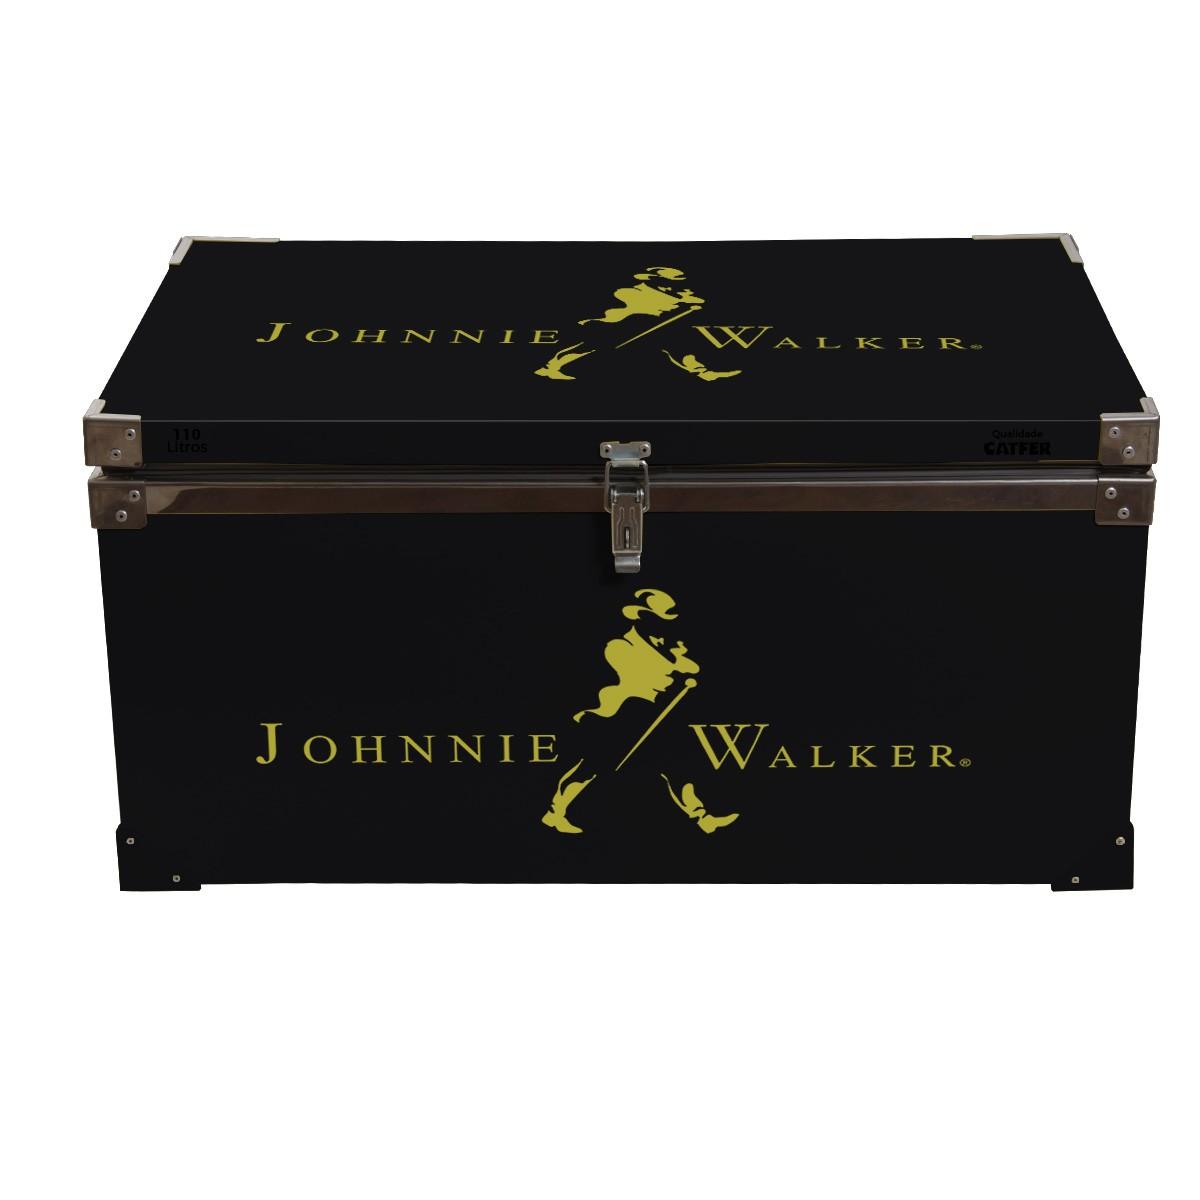 Caixa Térmica 110 Litros Johnnie Walker